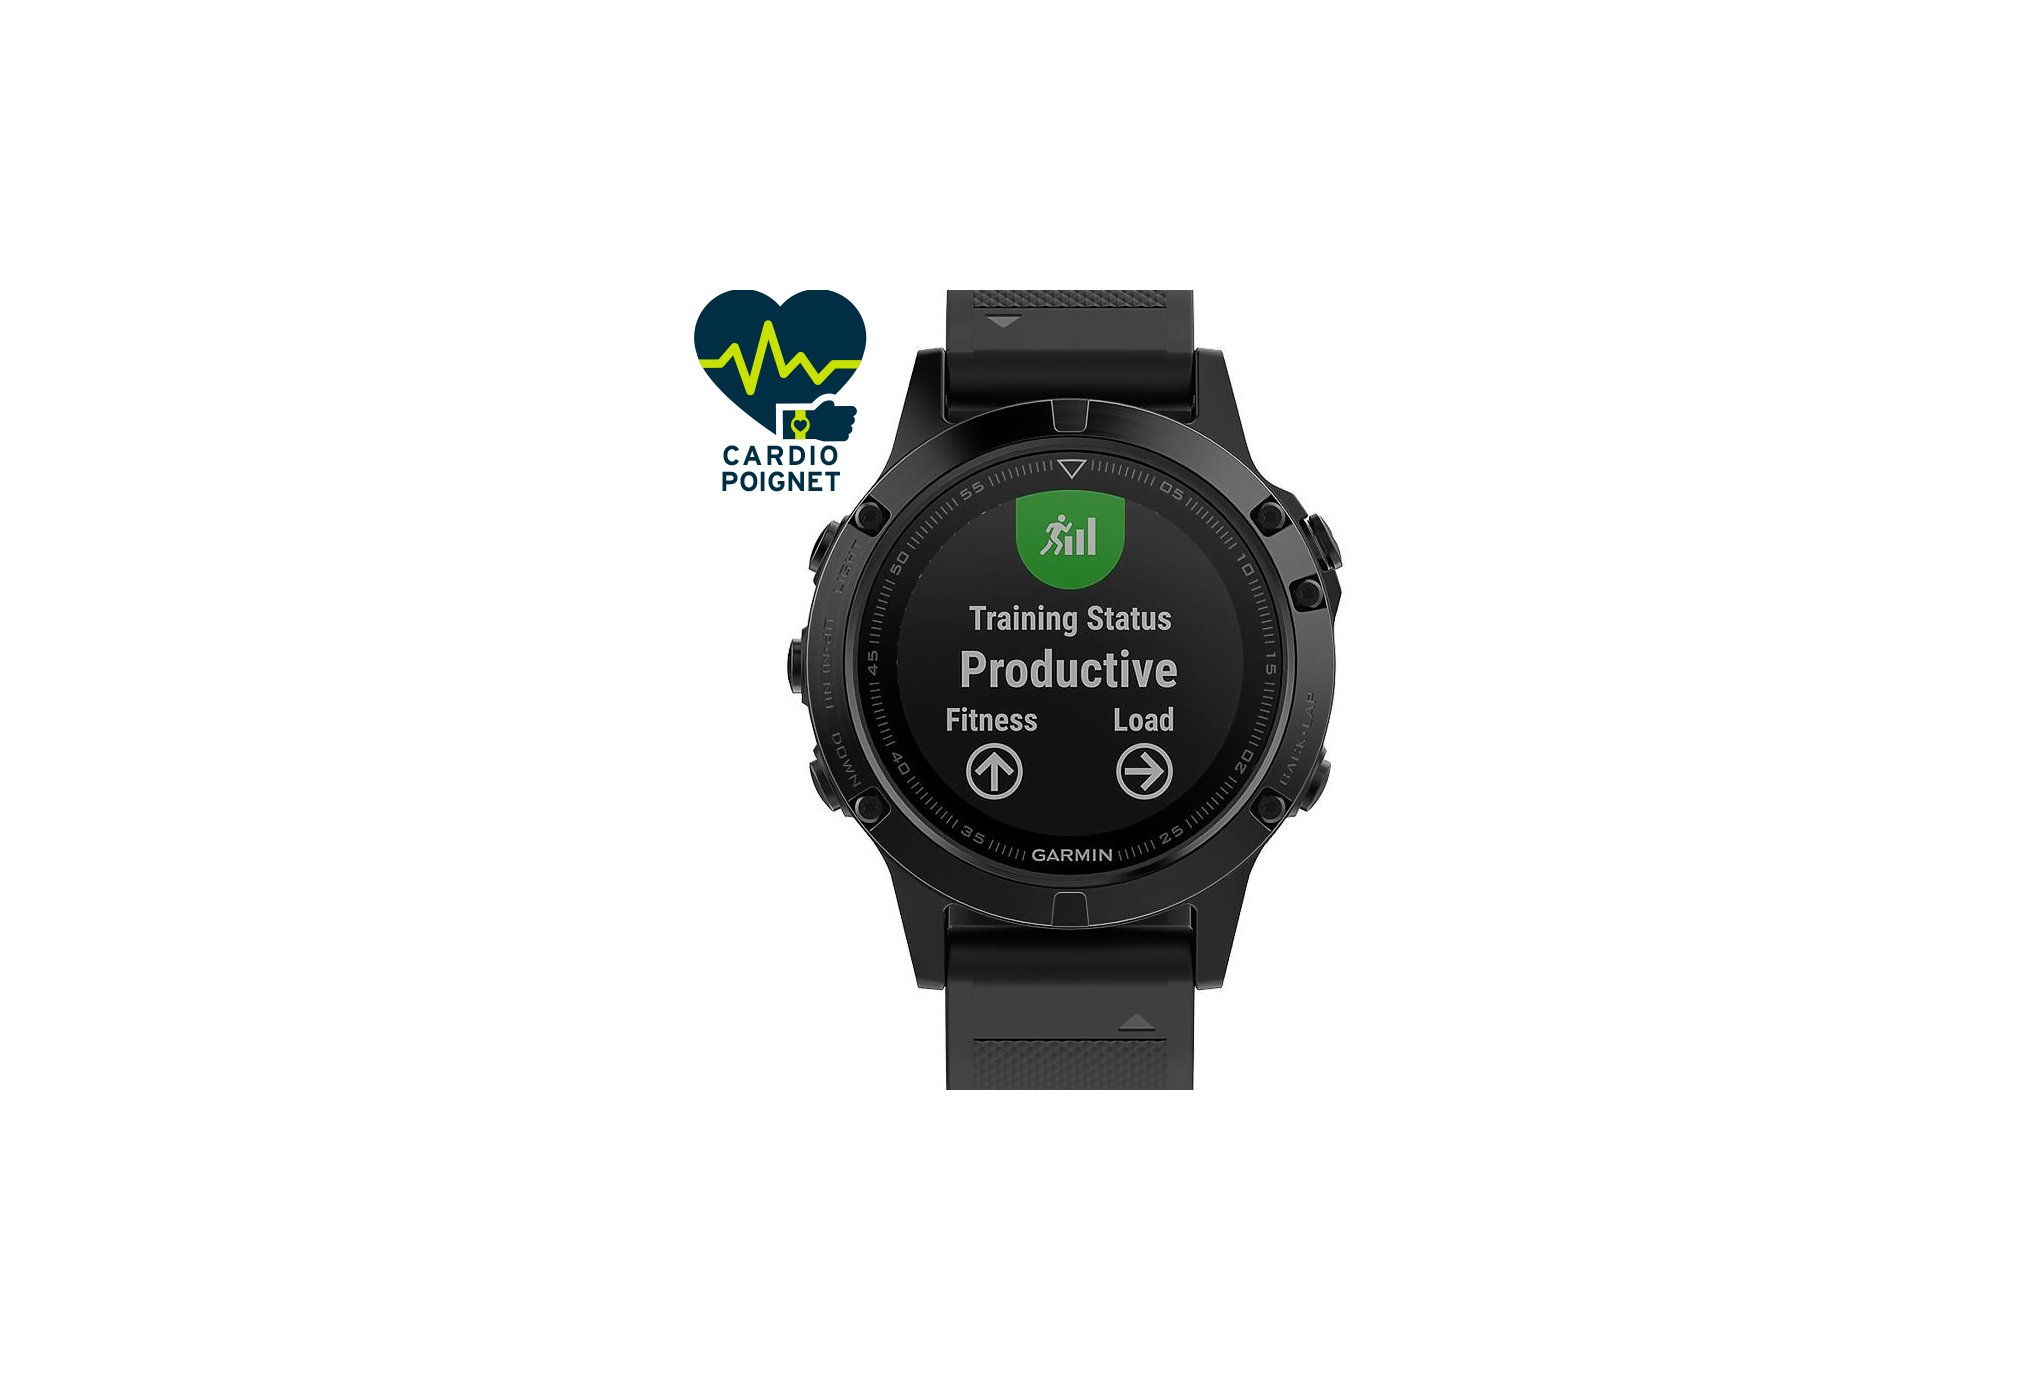 Garmin Reloj Fénix 5 Sapphire GPS Pack Performer HRM-Tri Cardio-Gps